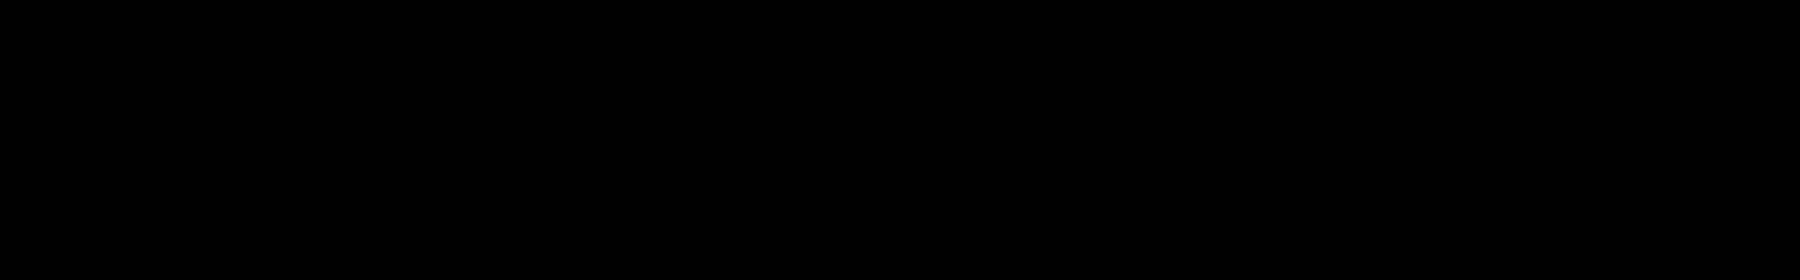 SEPTEMBER X audio waveform